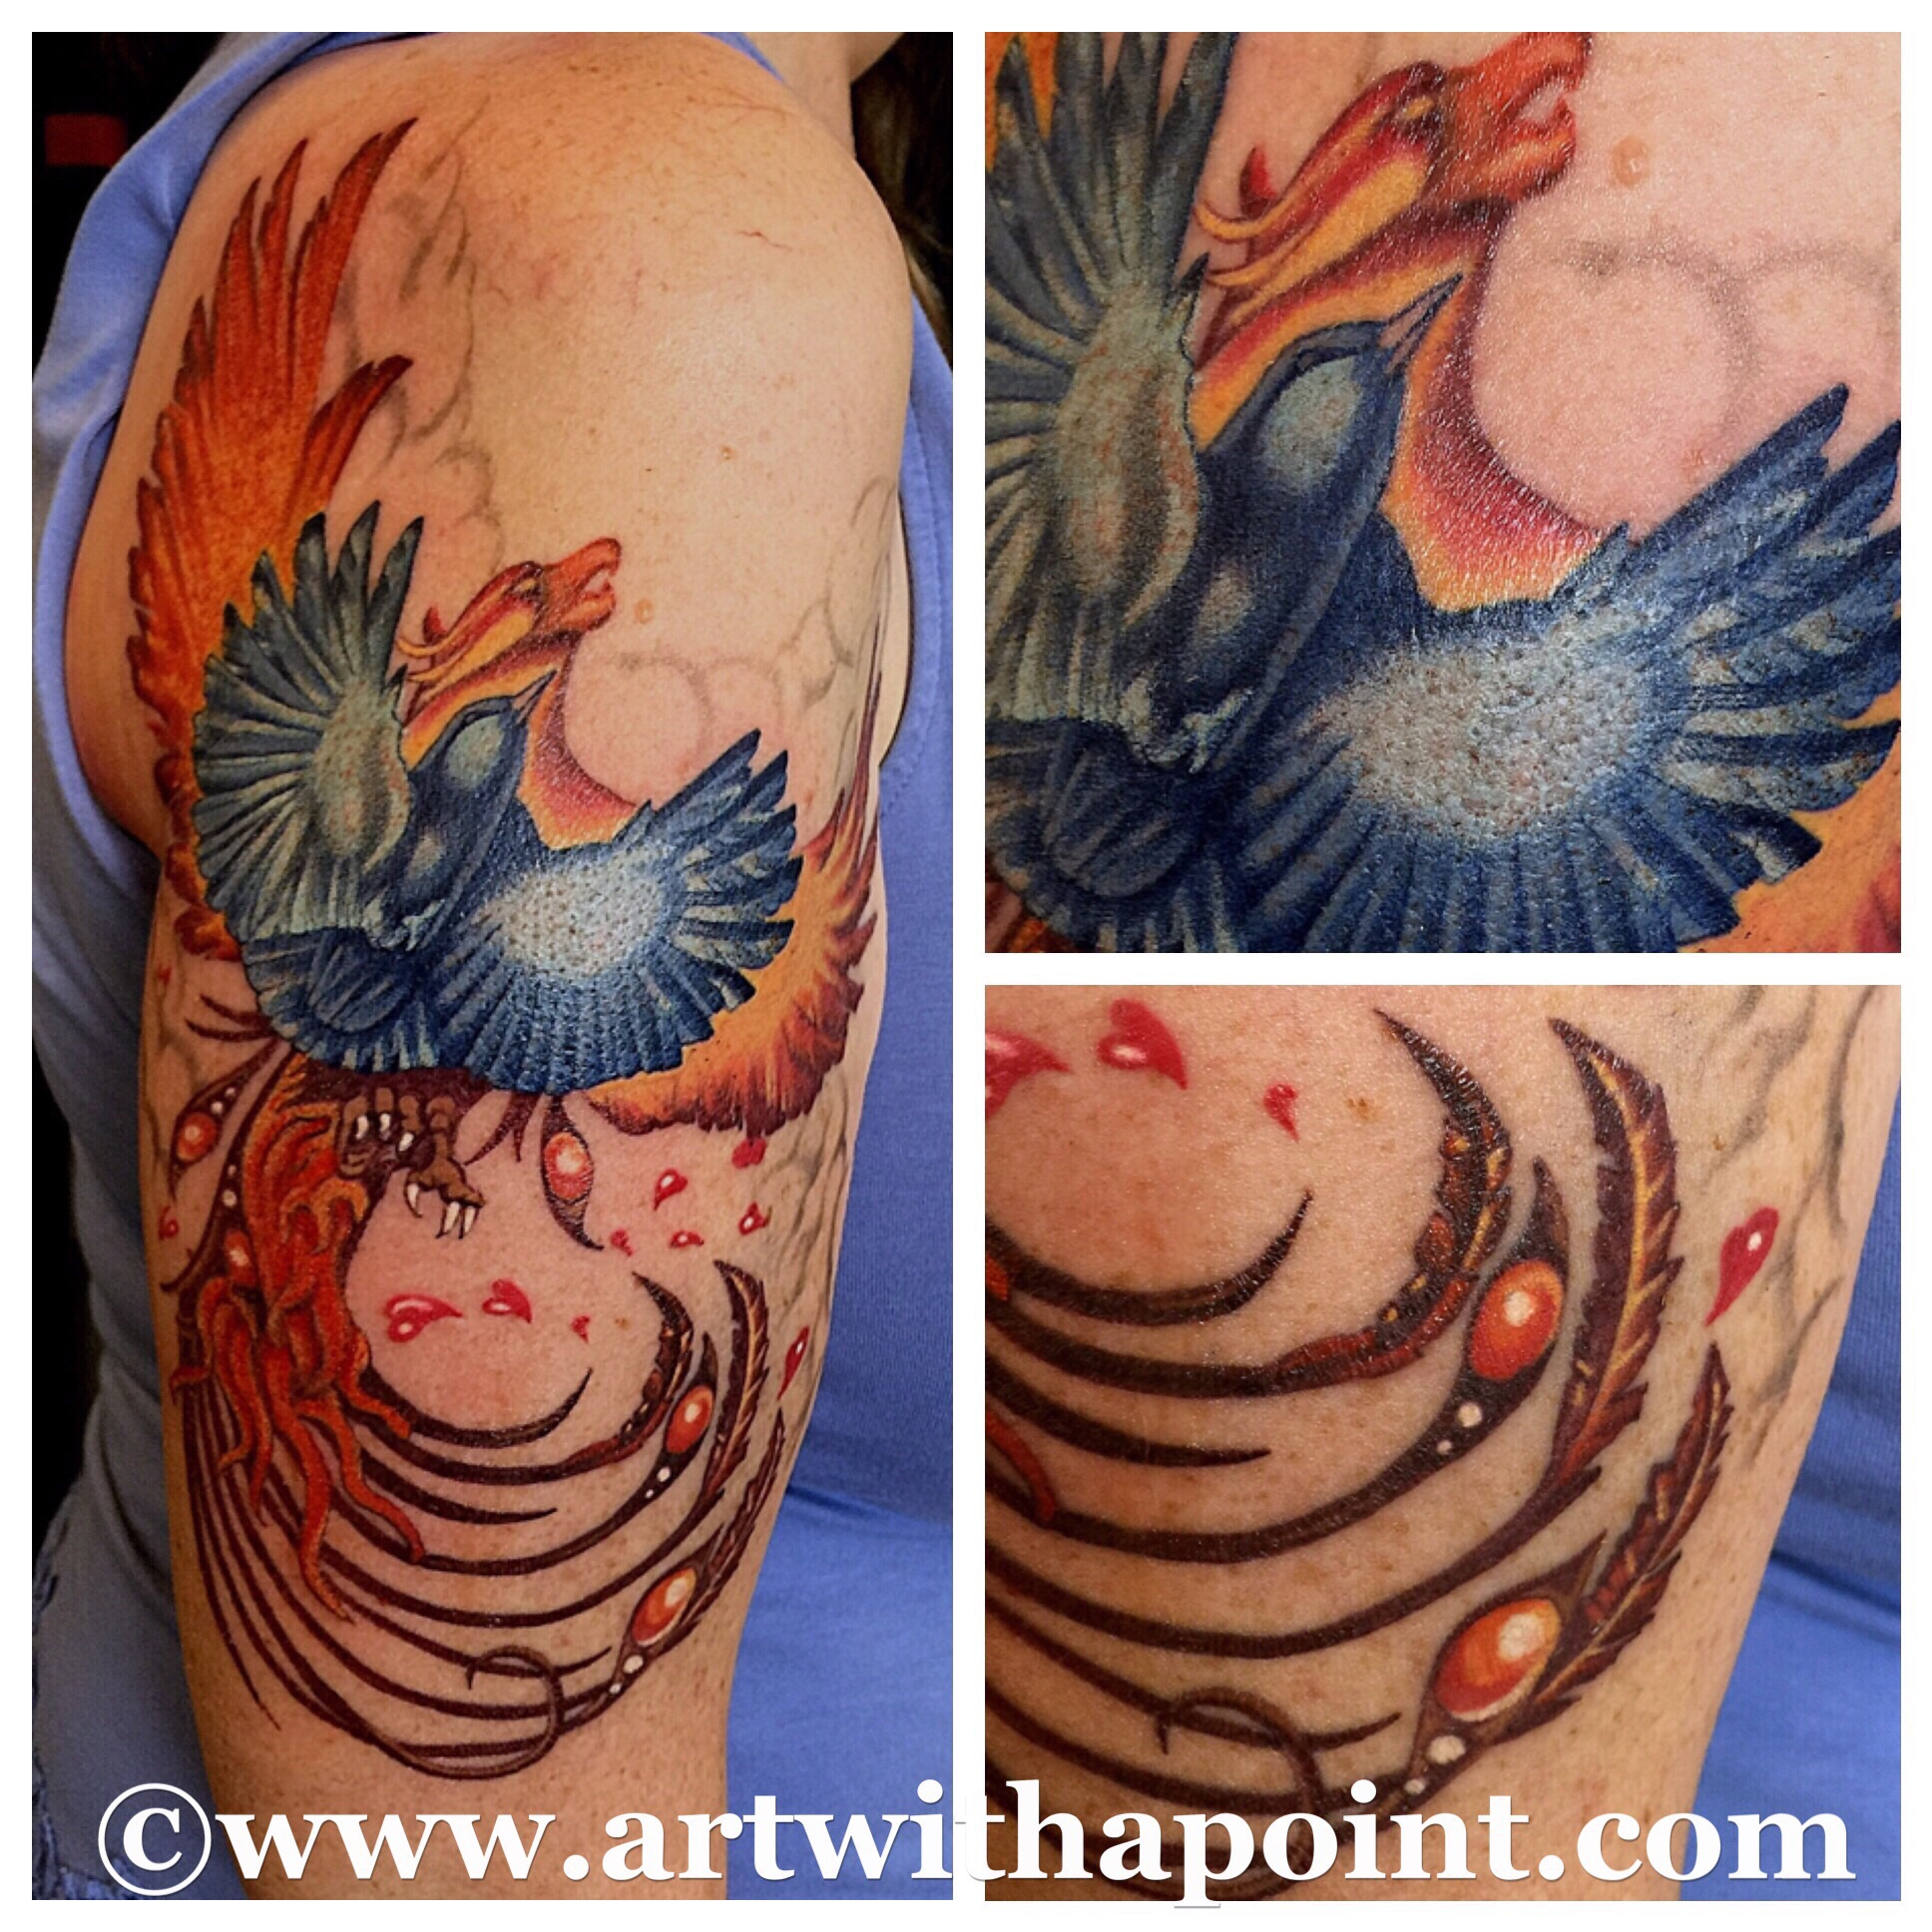 art with a point custom tattoo studio minneapolis